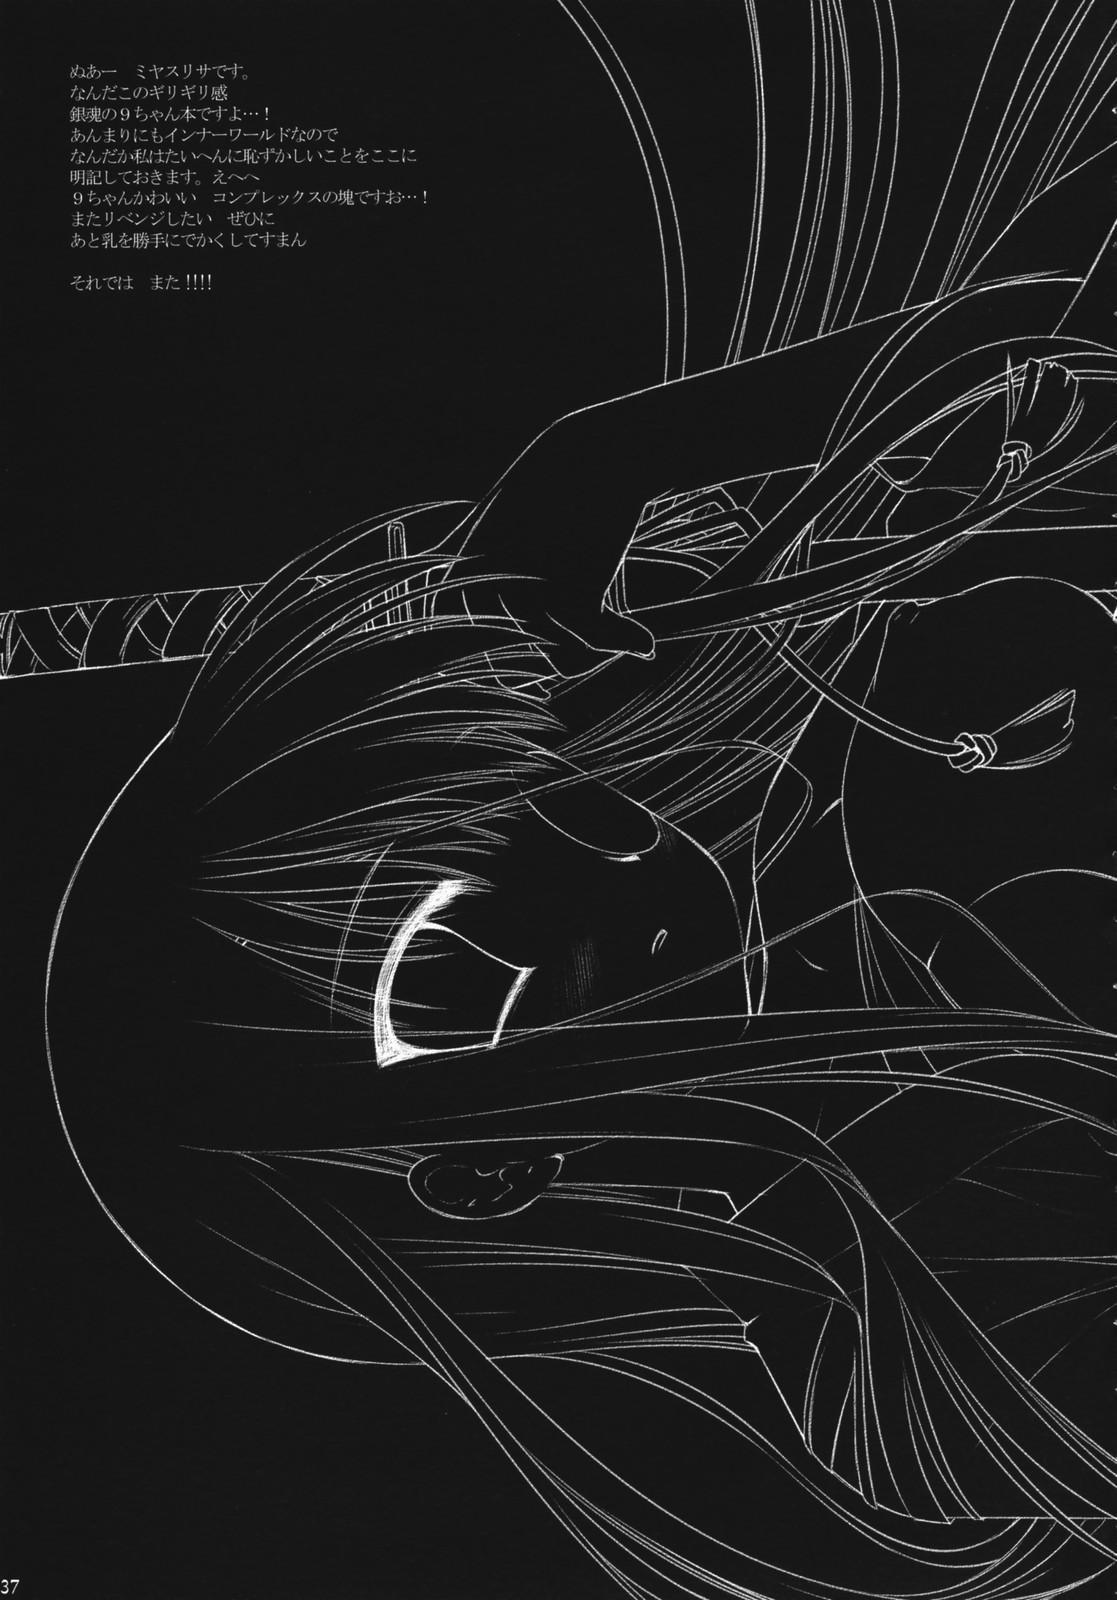 Torikagohime The Birdcage Princess 35